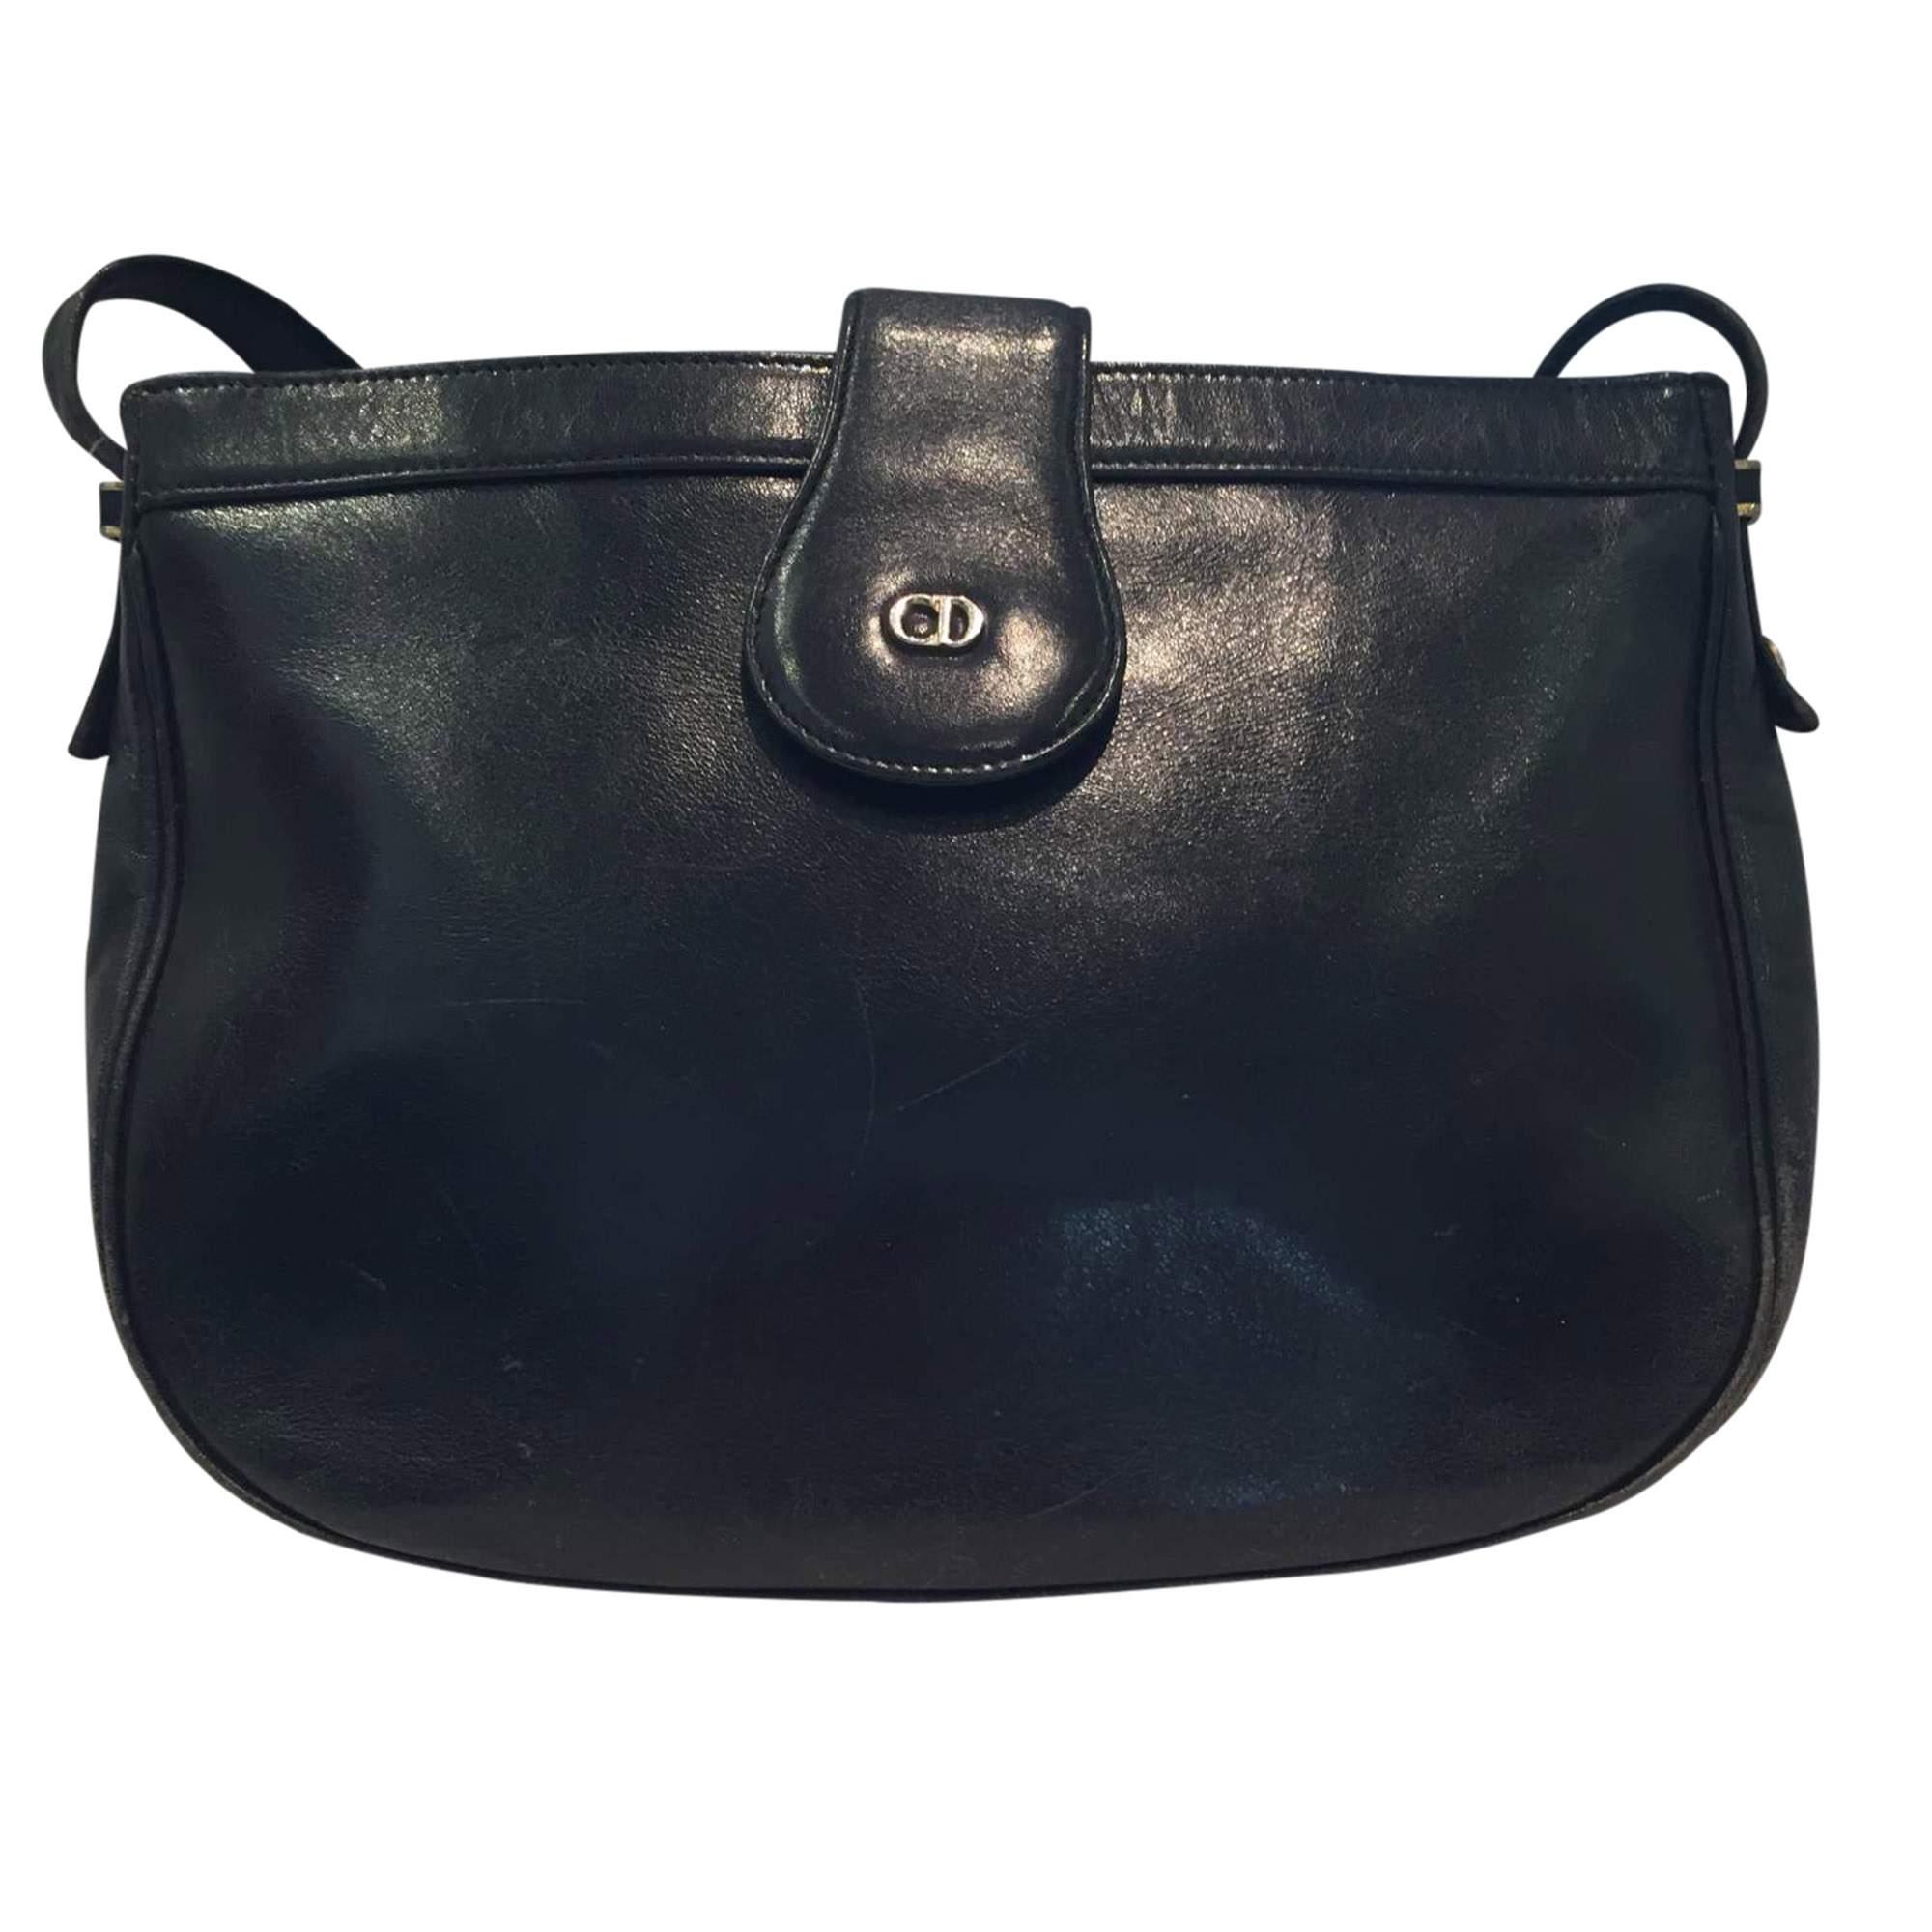 a229b6063d Dior Vintage 1980s leather Bag